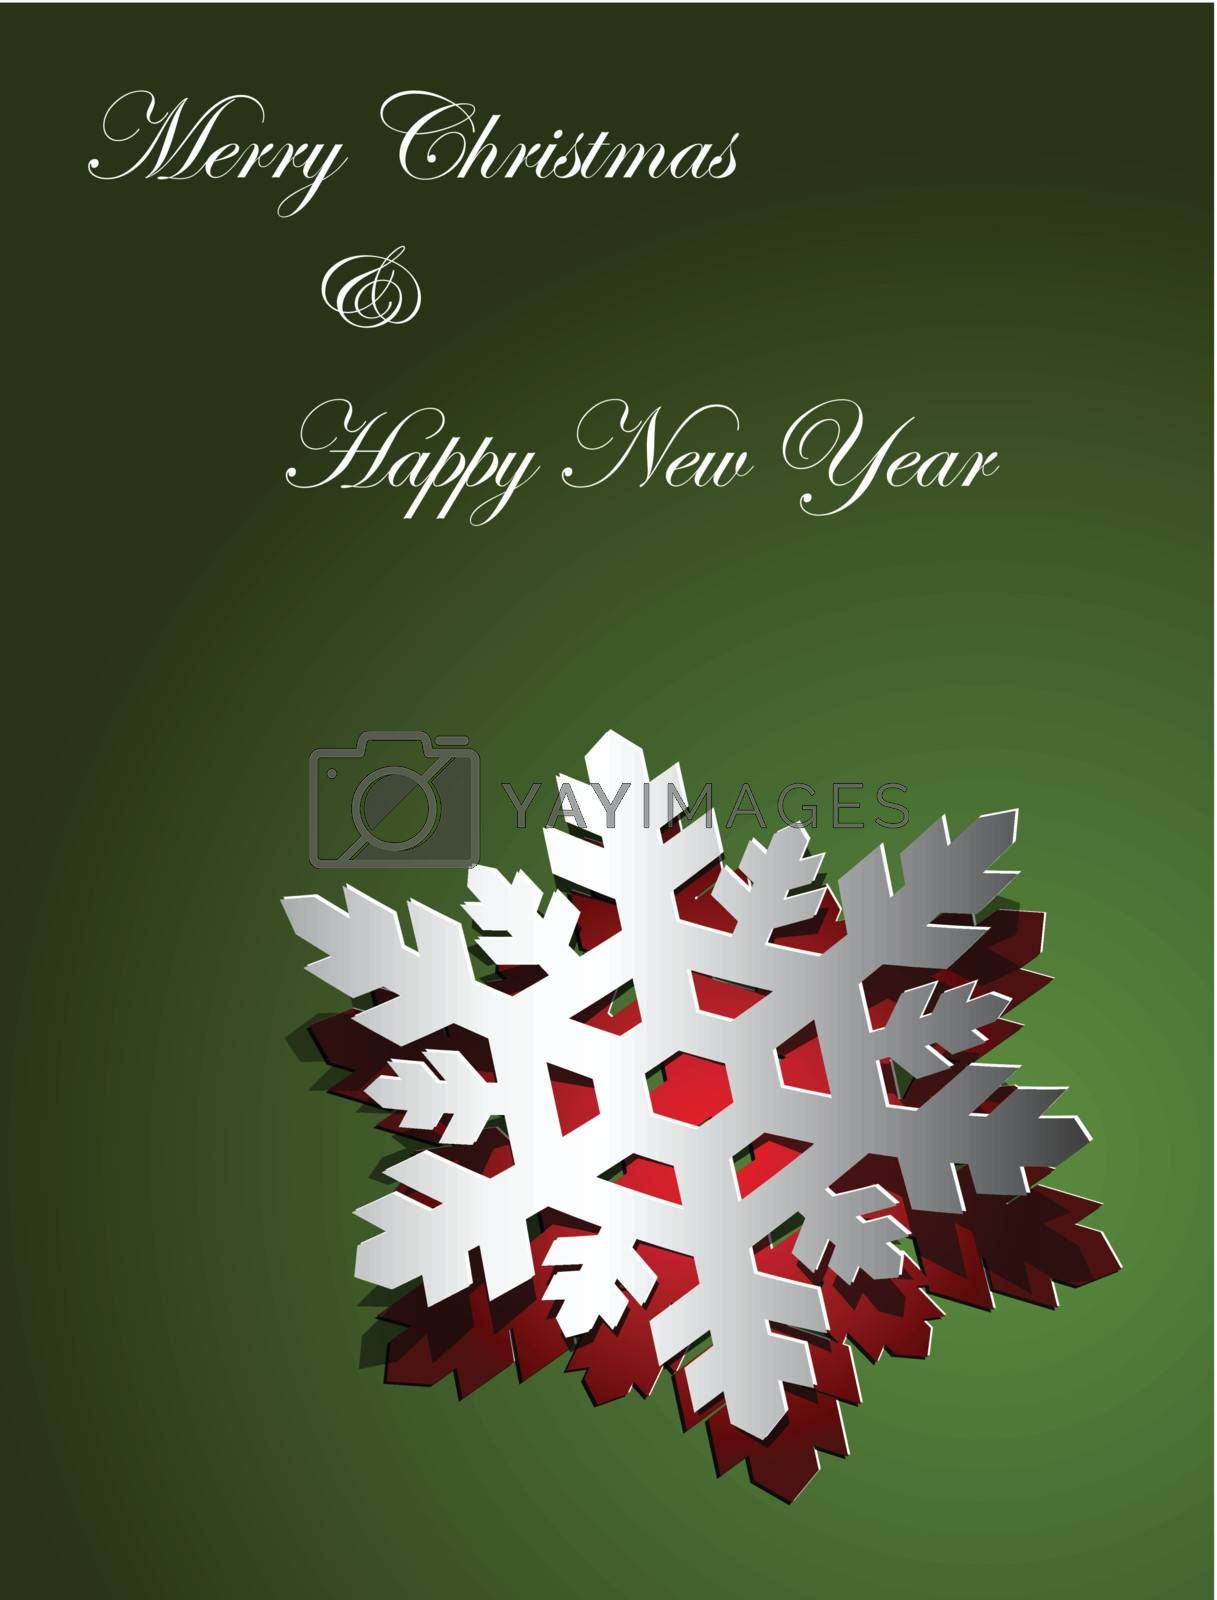 Christmas card design snowflake sticker paper cut